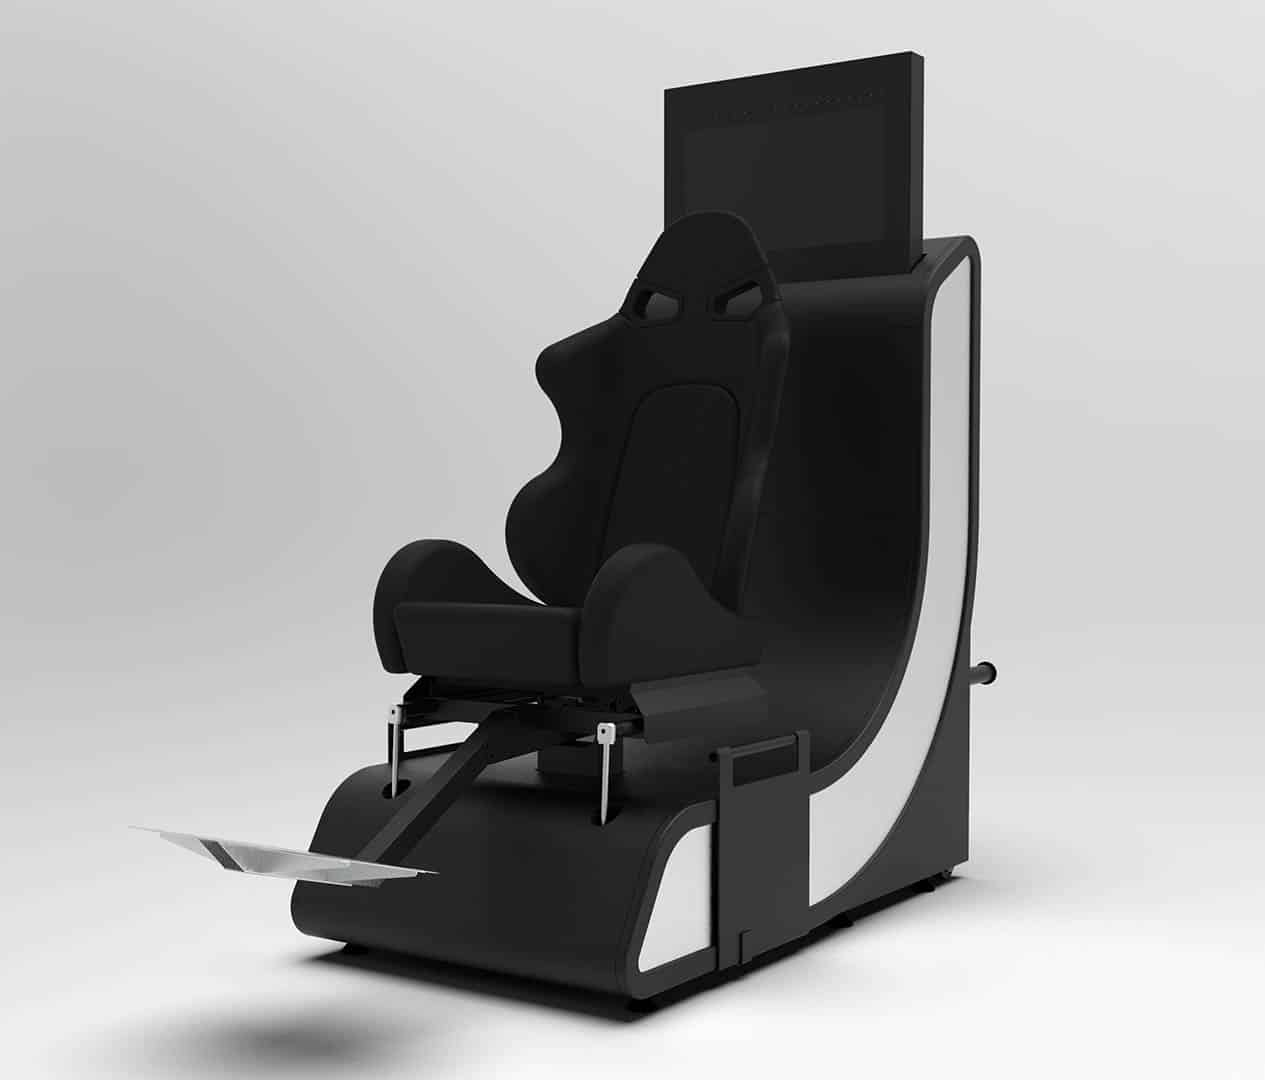 Motion seat design